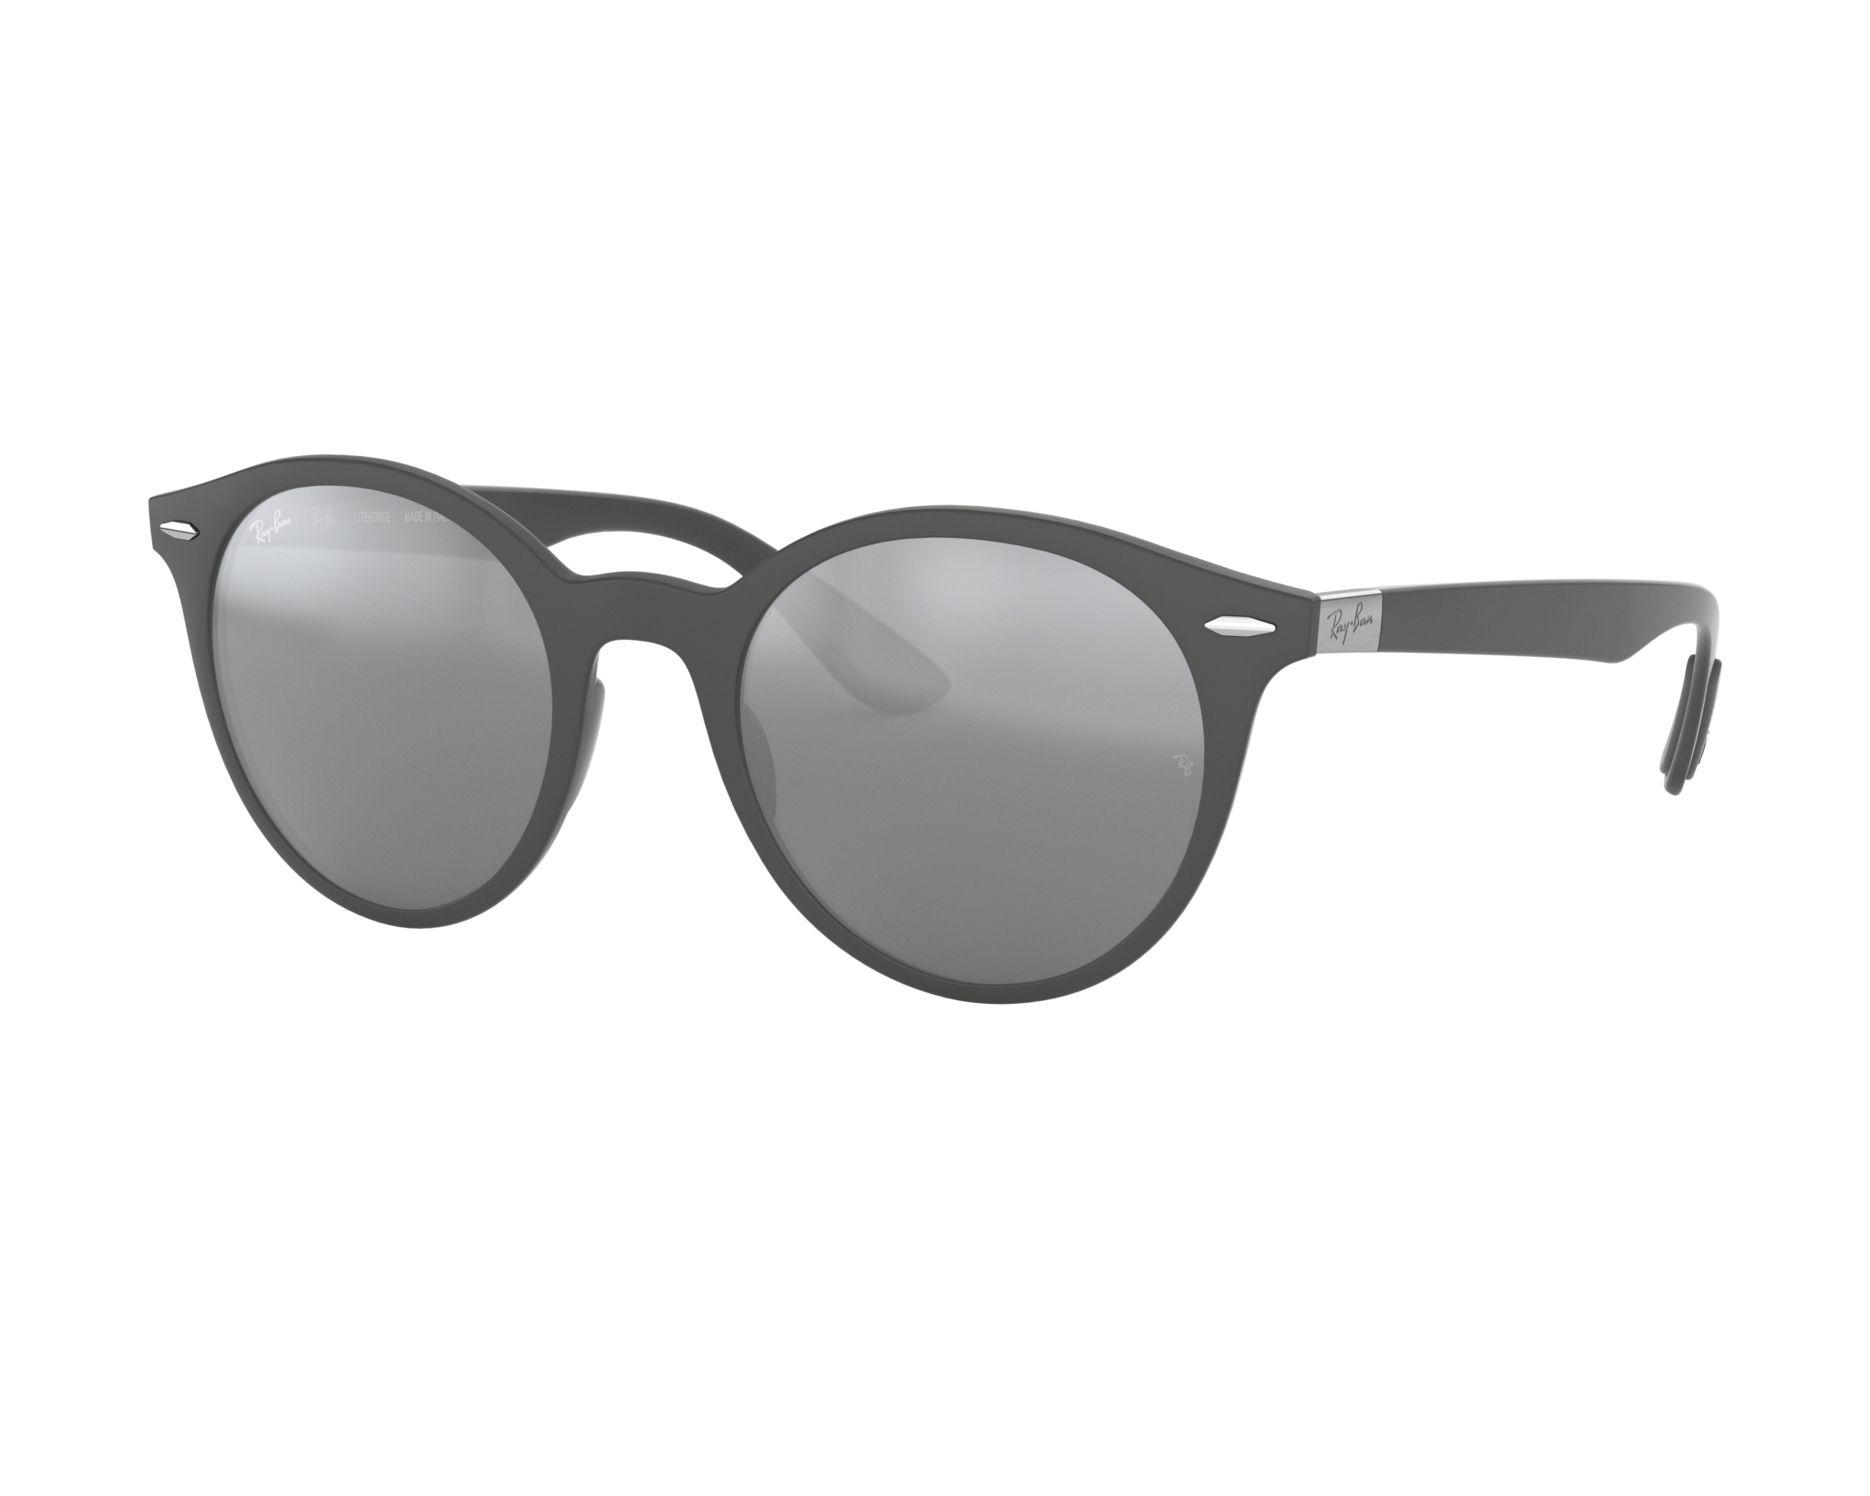 Sunglasses Ray-Ban RB-4296 633288 51-21 Grey 2addd18619